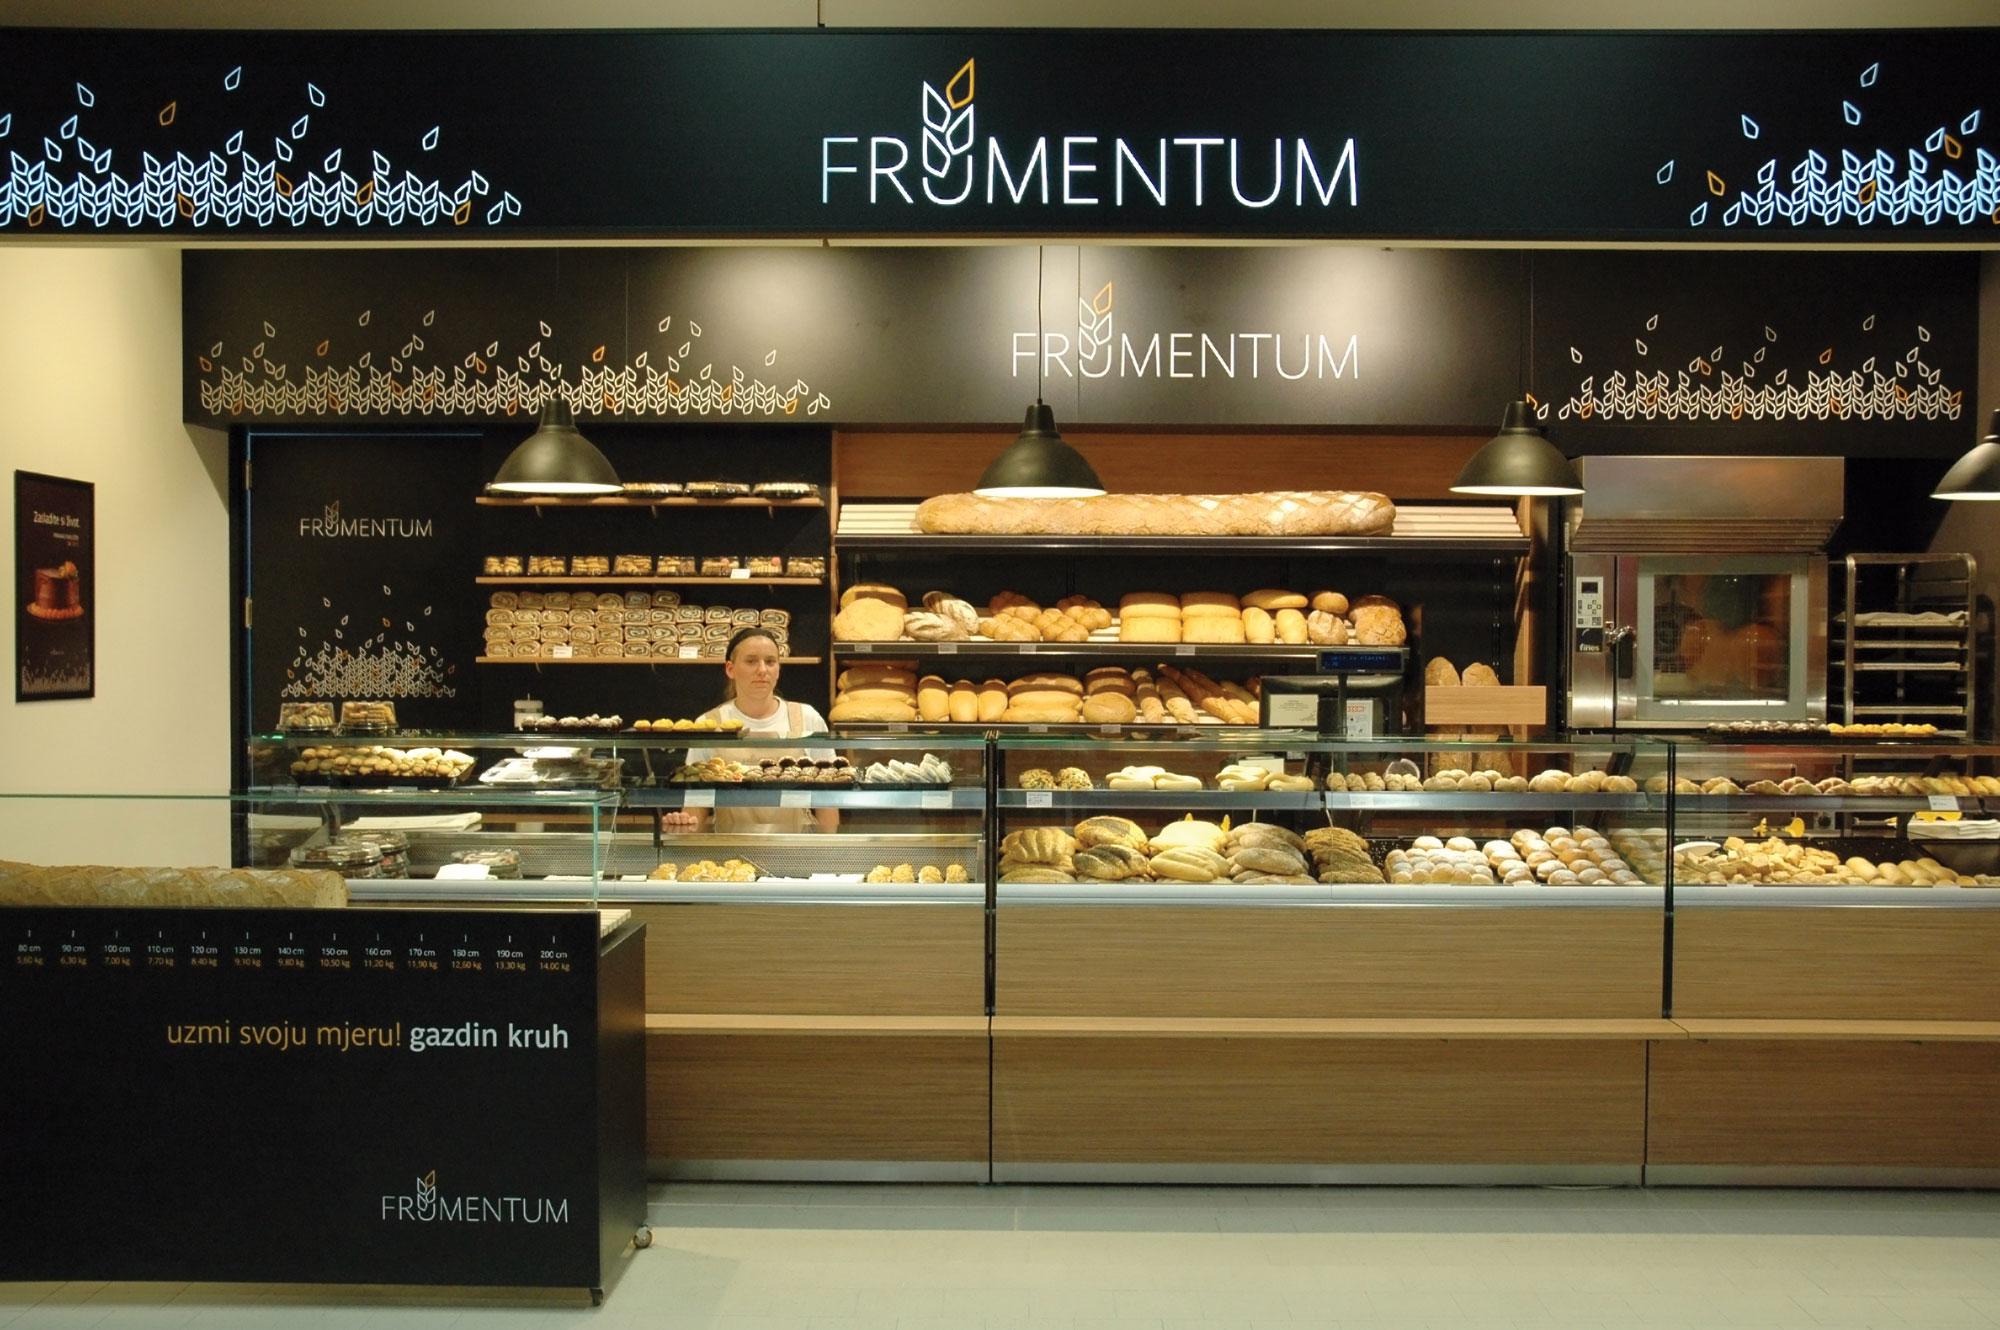 masavukmanovic.com - frumentum bakeries 03